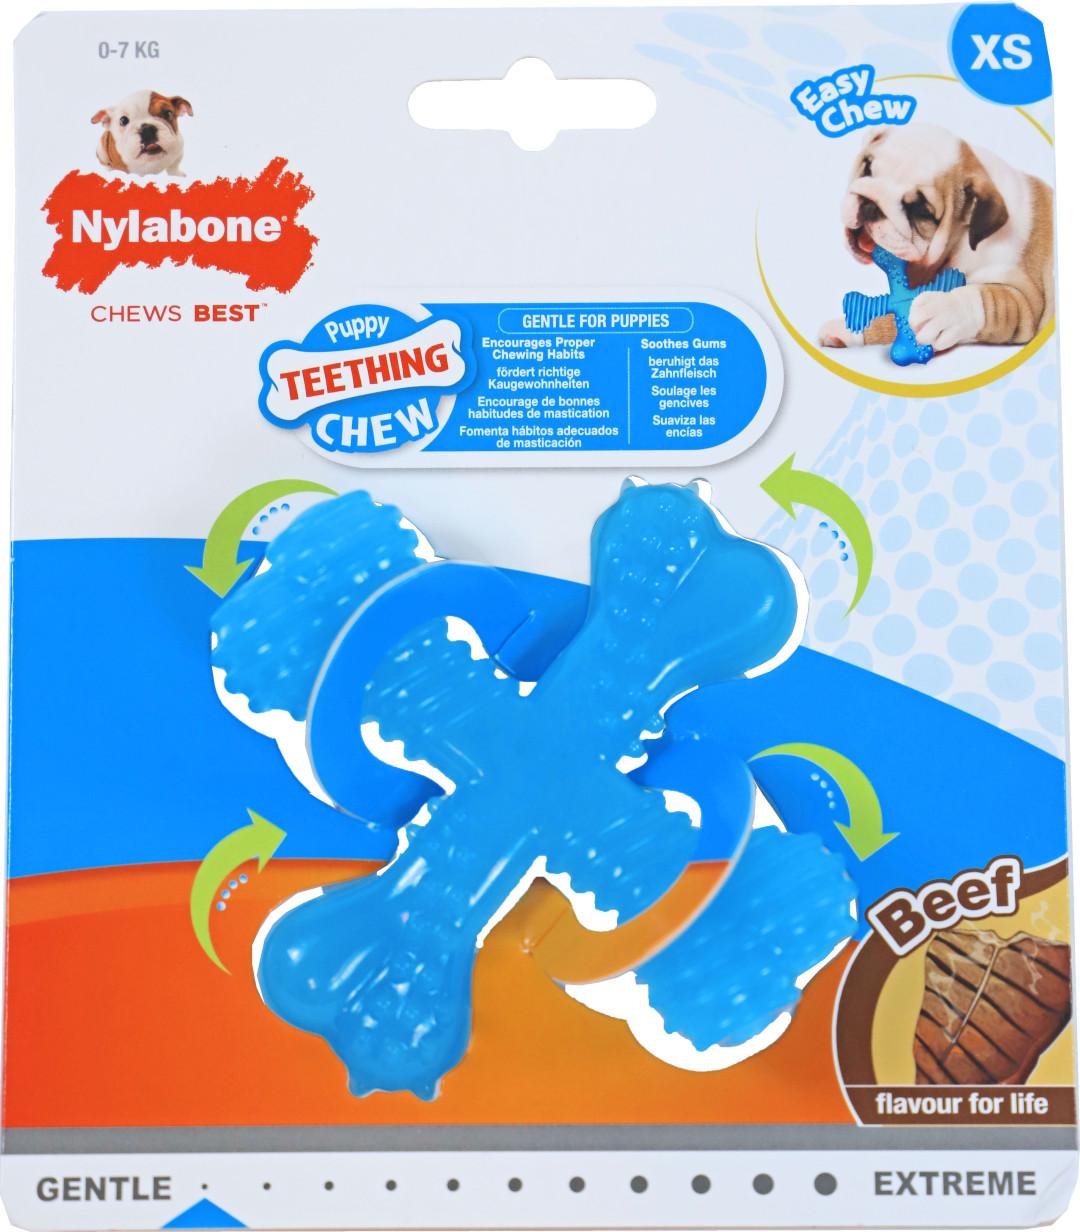 NylaBone Puppy Chew Teething beef XS